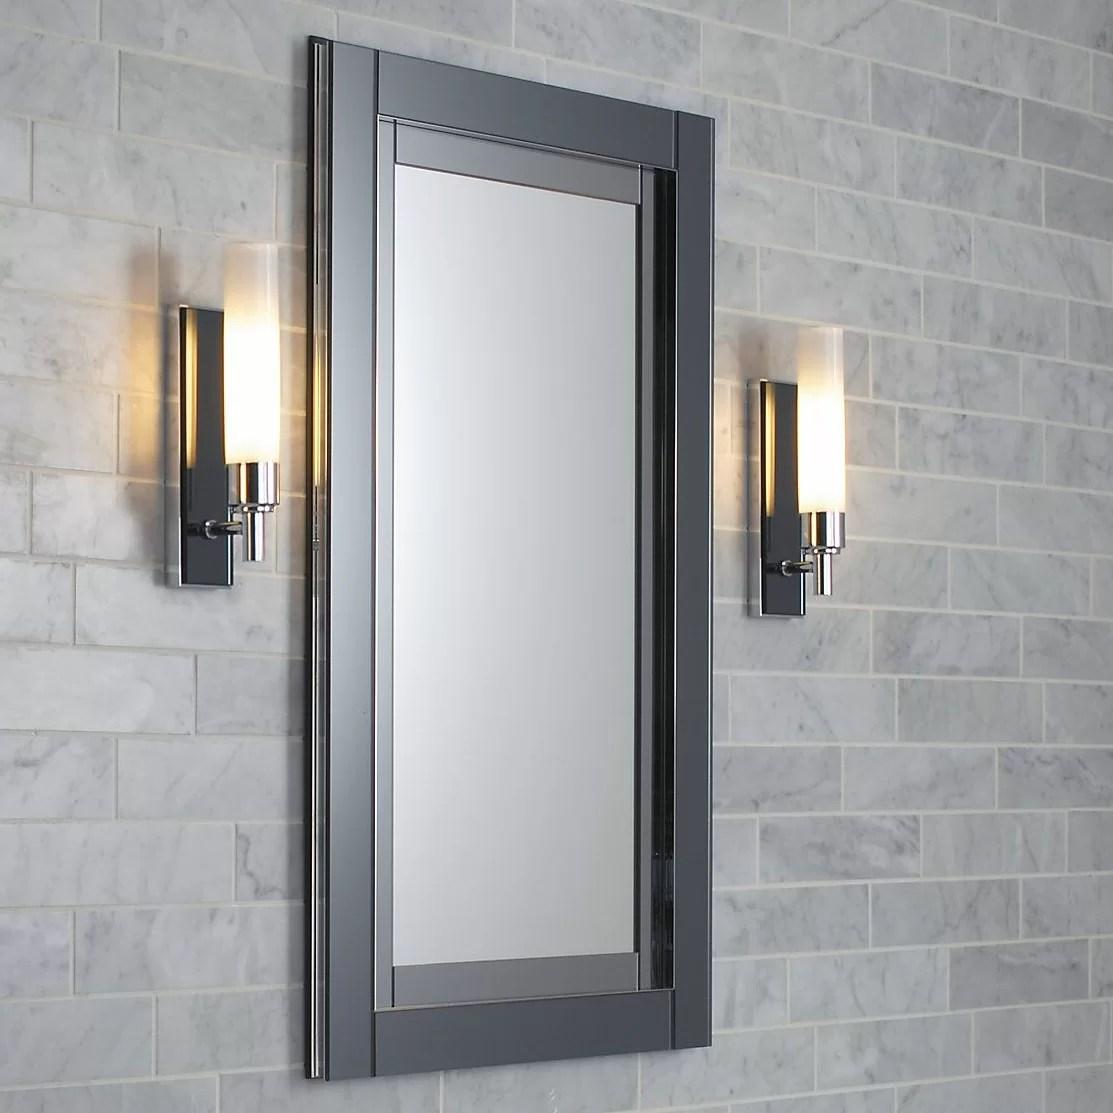 Robern Mirror Cabinet. Robern UC4827FP Uplift 48